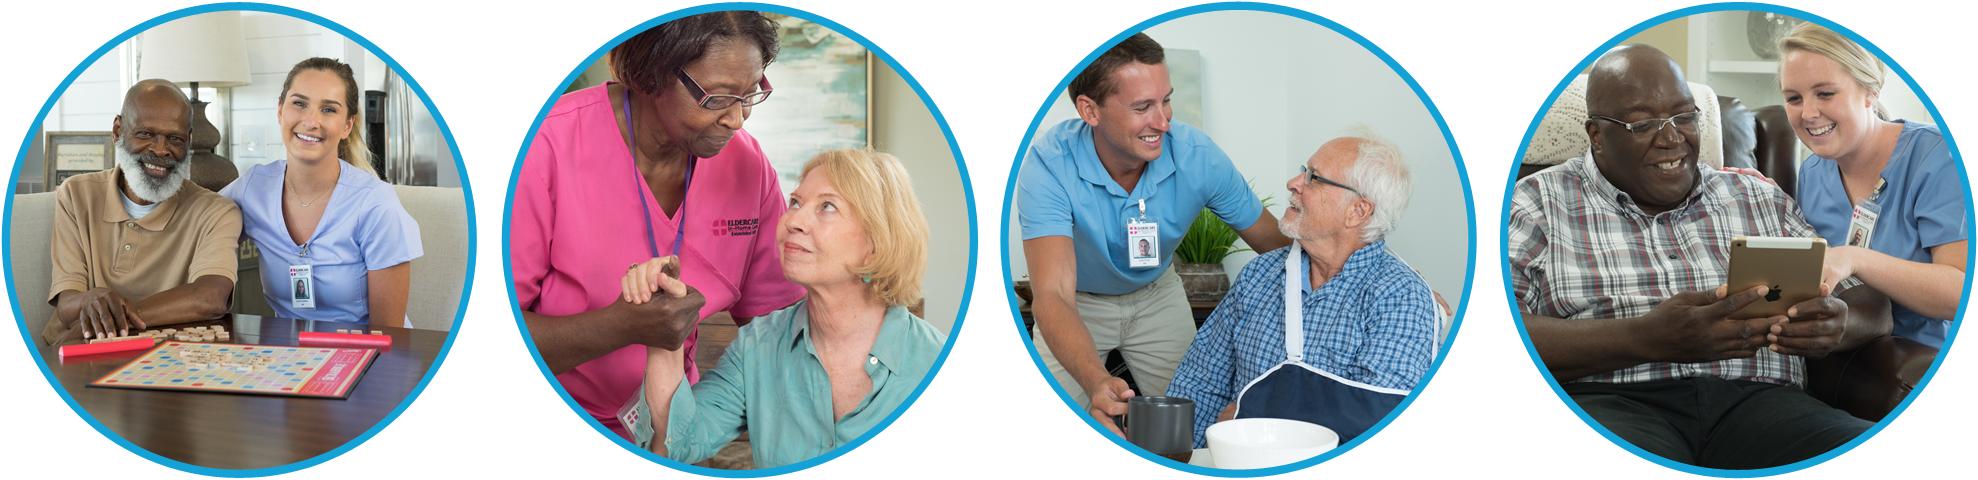 Home Health Care Careers | CNA, Home Health Aides, Senior Helpers, Elderly Companions